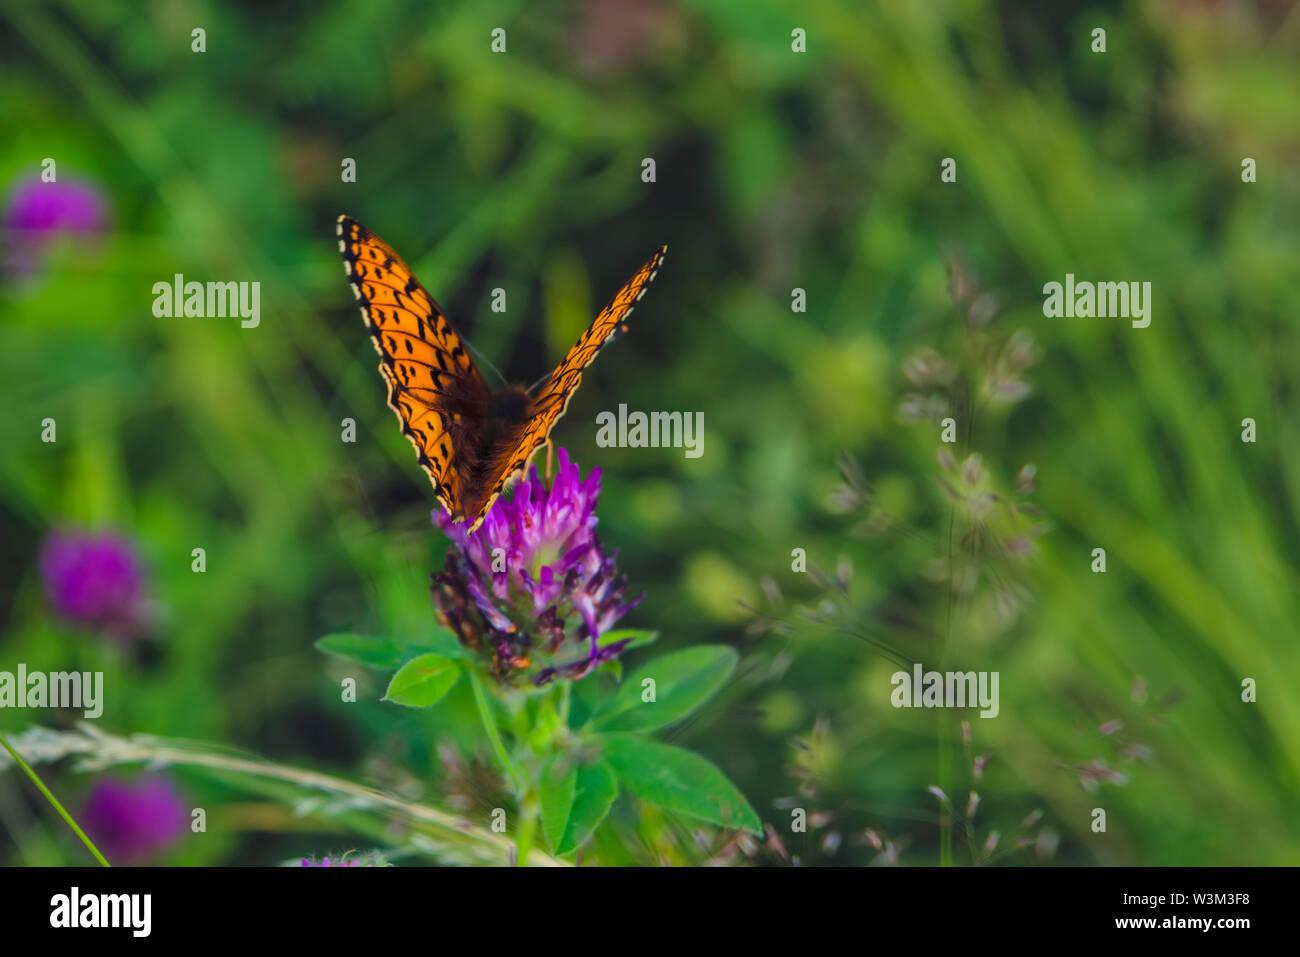 Argynnis paphia. Beautiful Argynnis paphia butterfly in sunlight in herb garden. - Stock Image